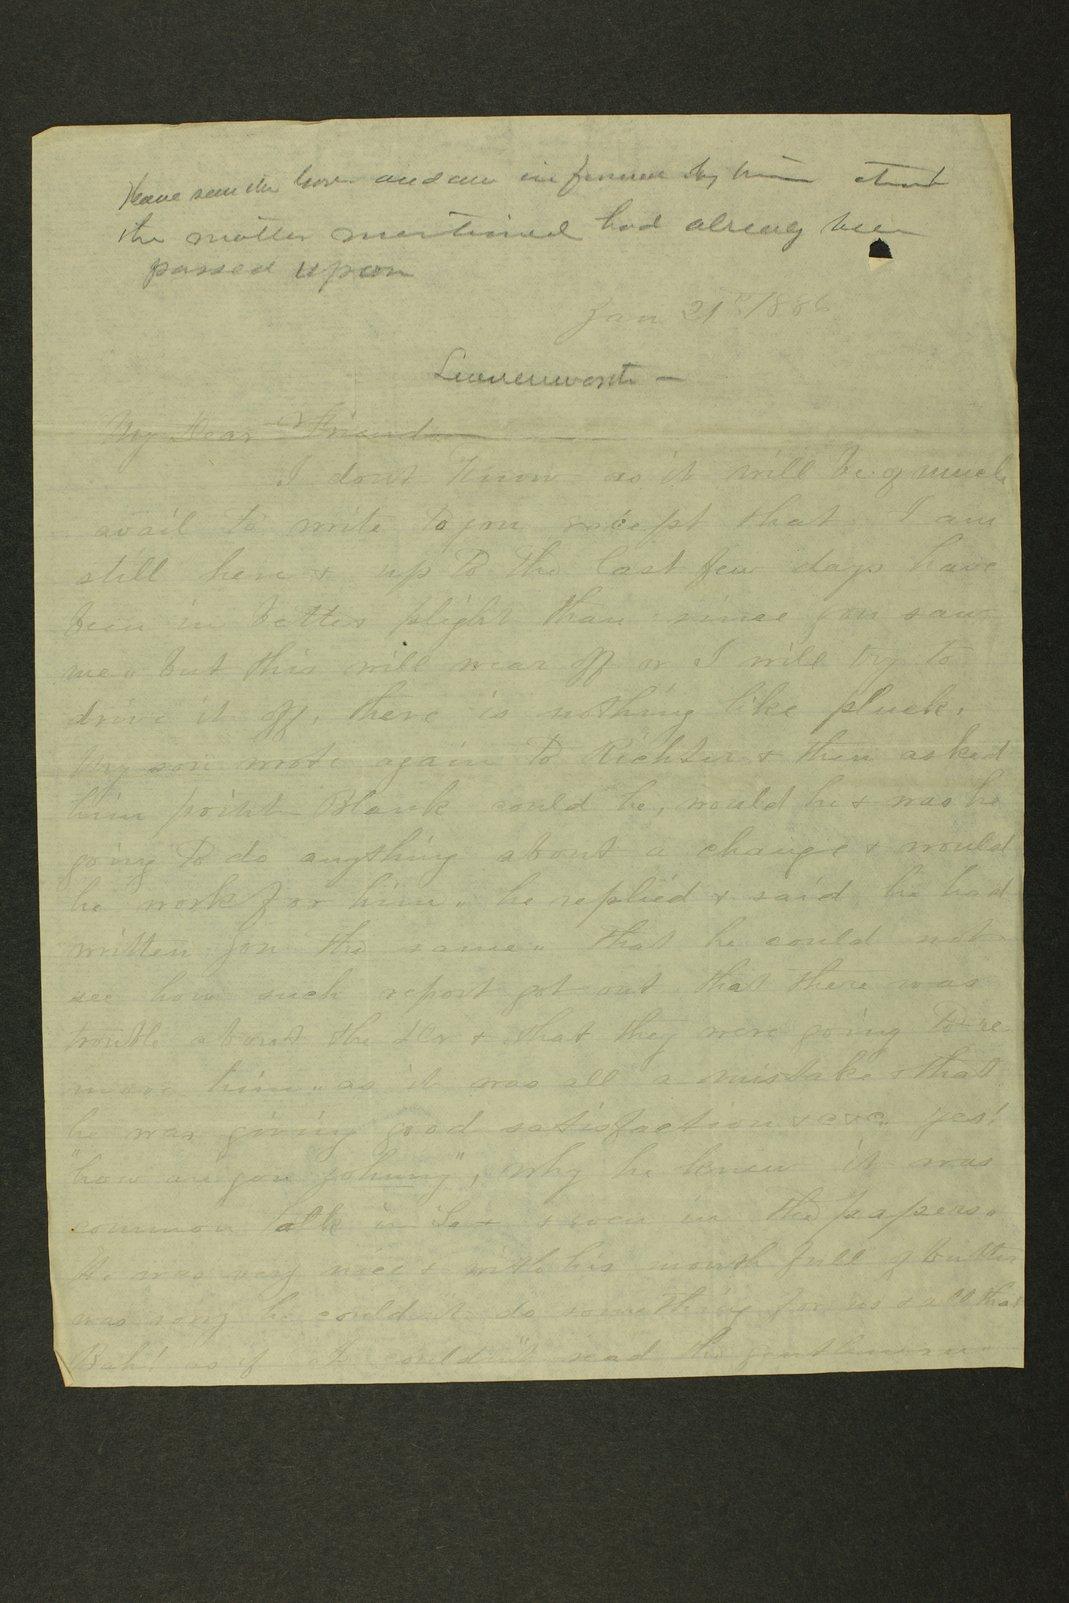 Kansas Adjutant General miscellaneous correpondence - 8